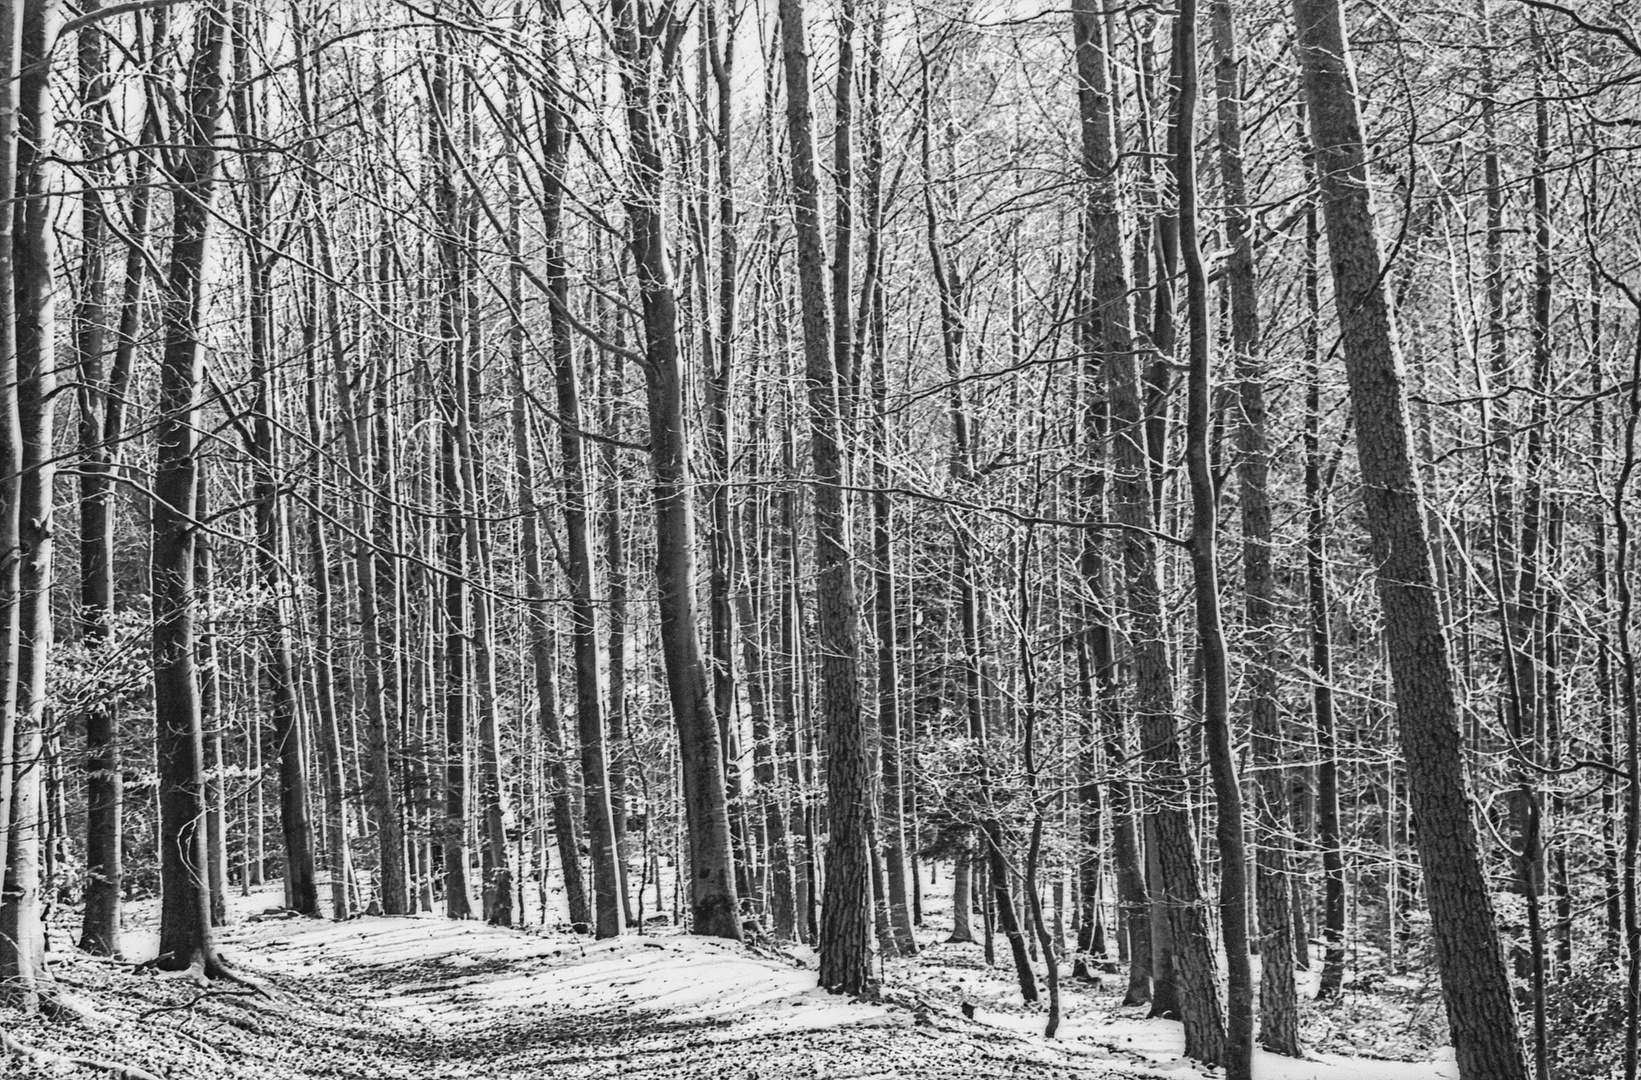 Wintertag im Wald